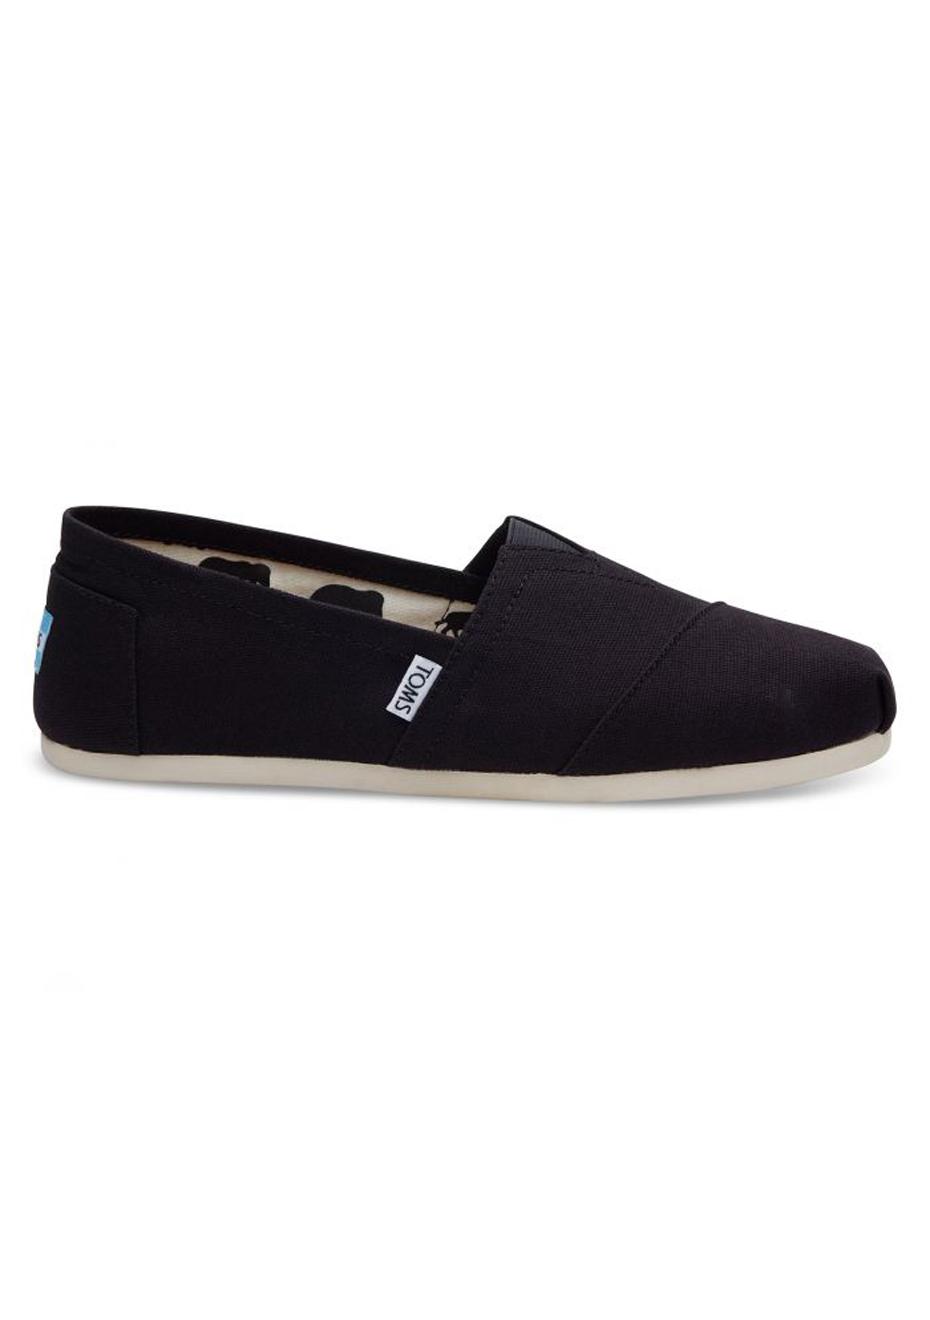 Toms Shoes - Mens Classic Alpargata